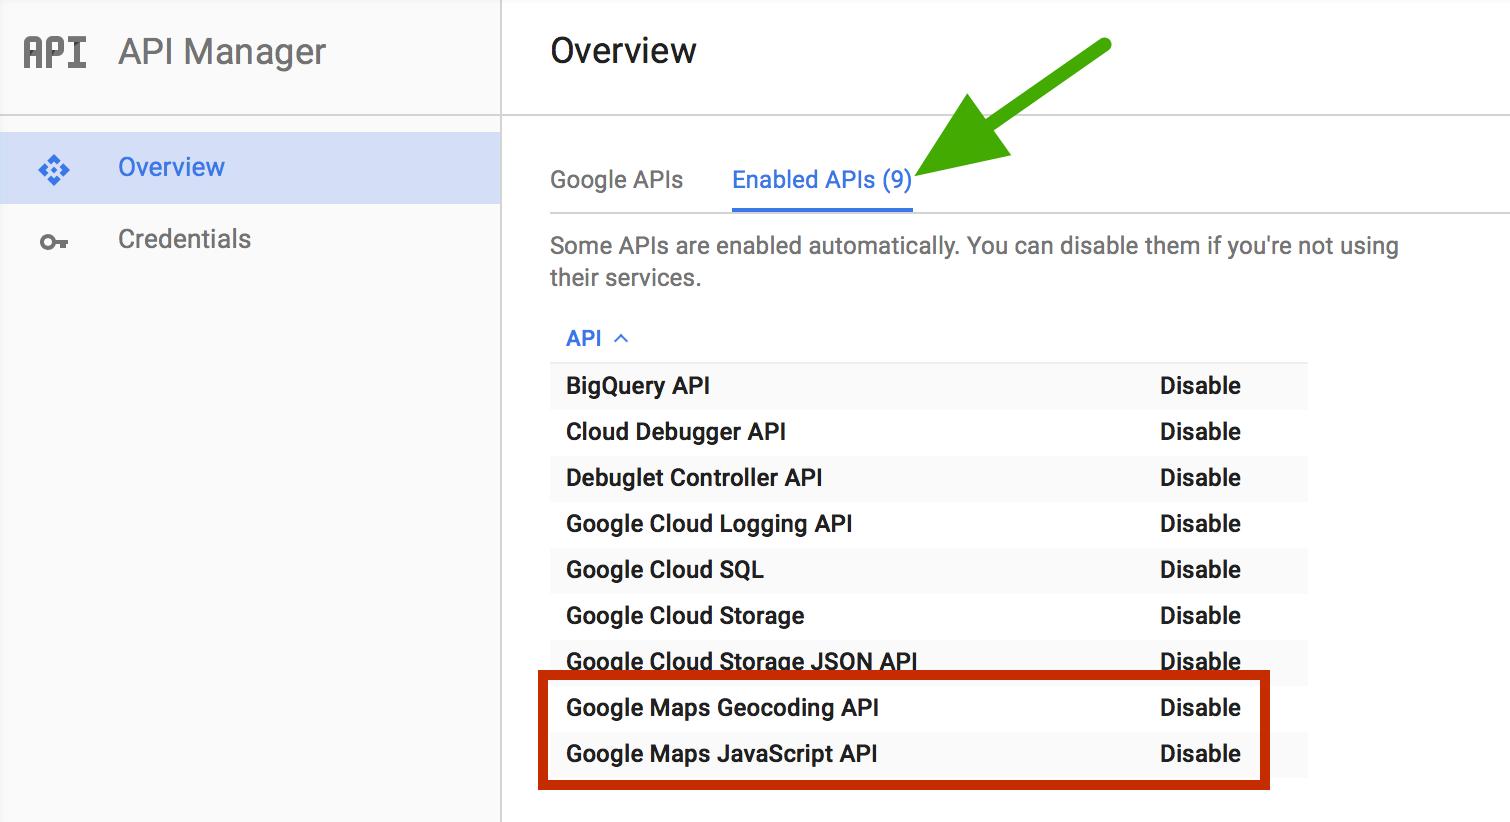 Make sure both Google Maps Geocoding API and Google Maps JavaScript API are enabled.